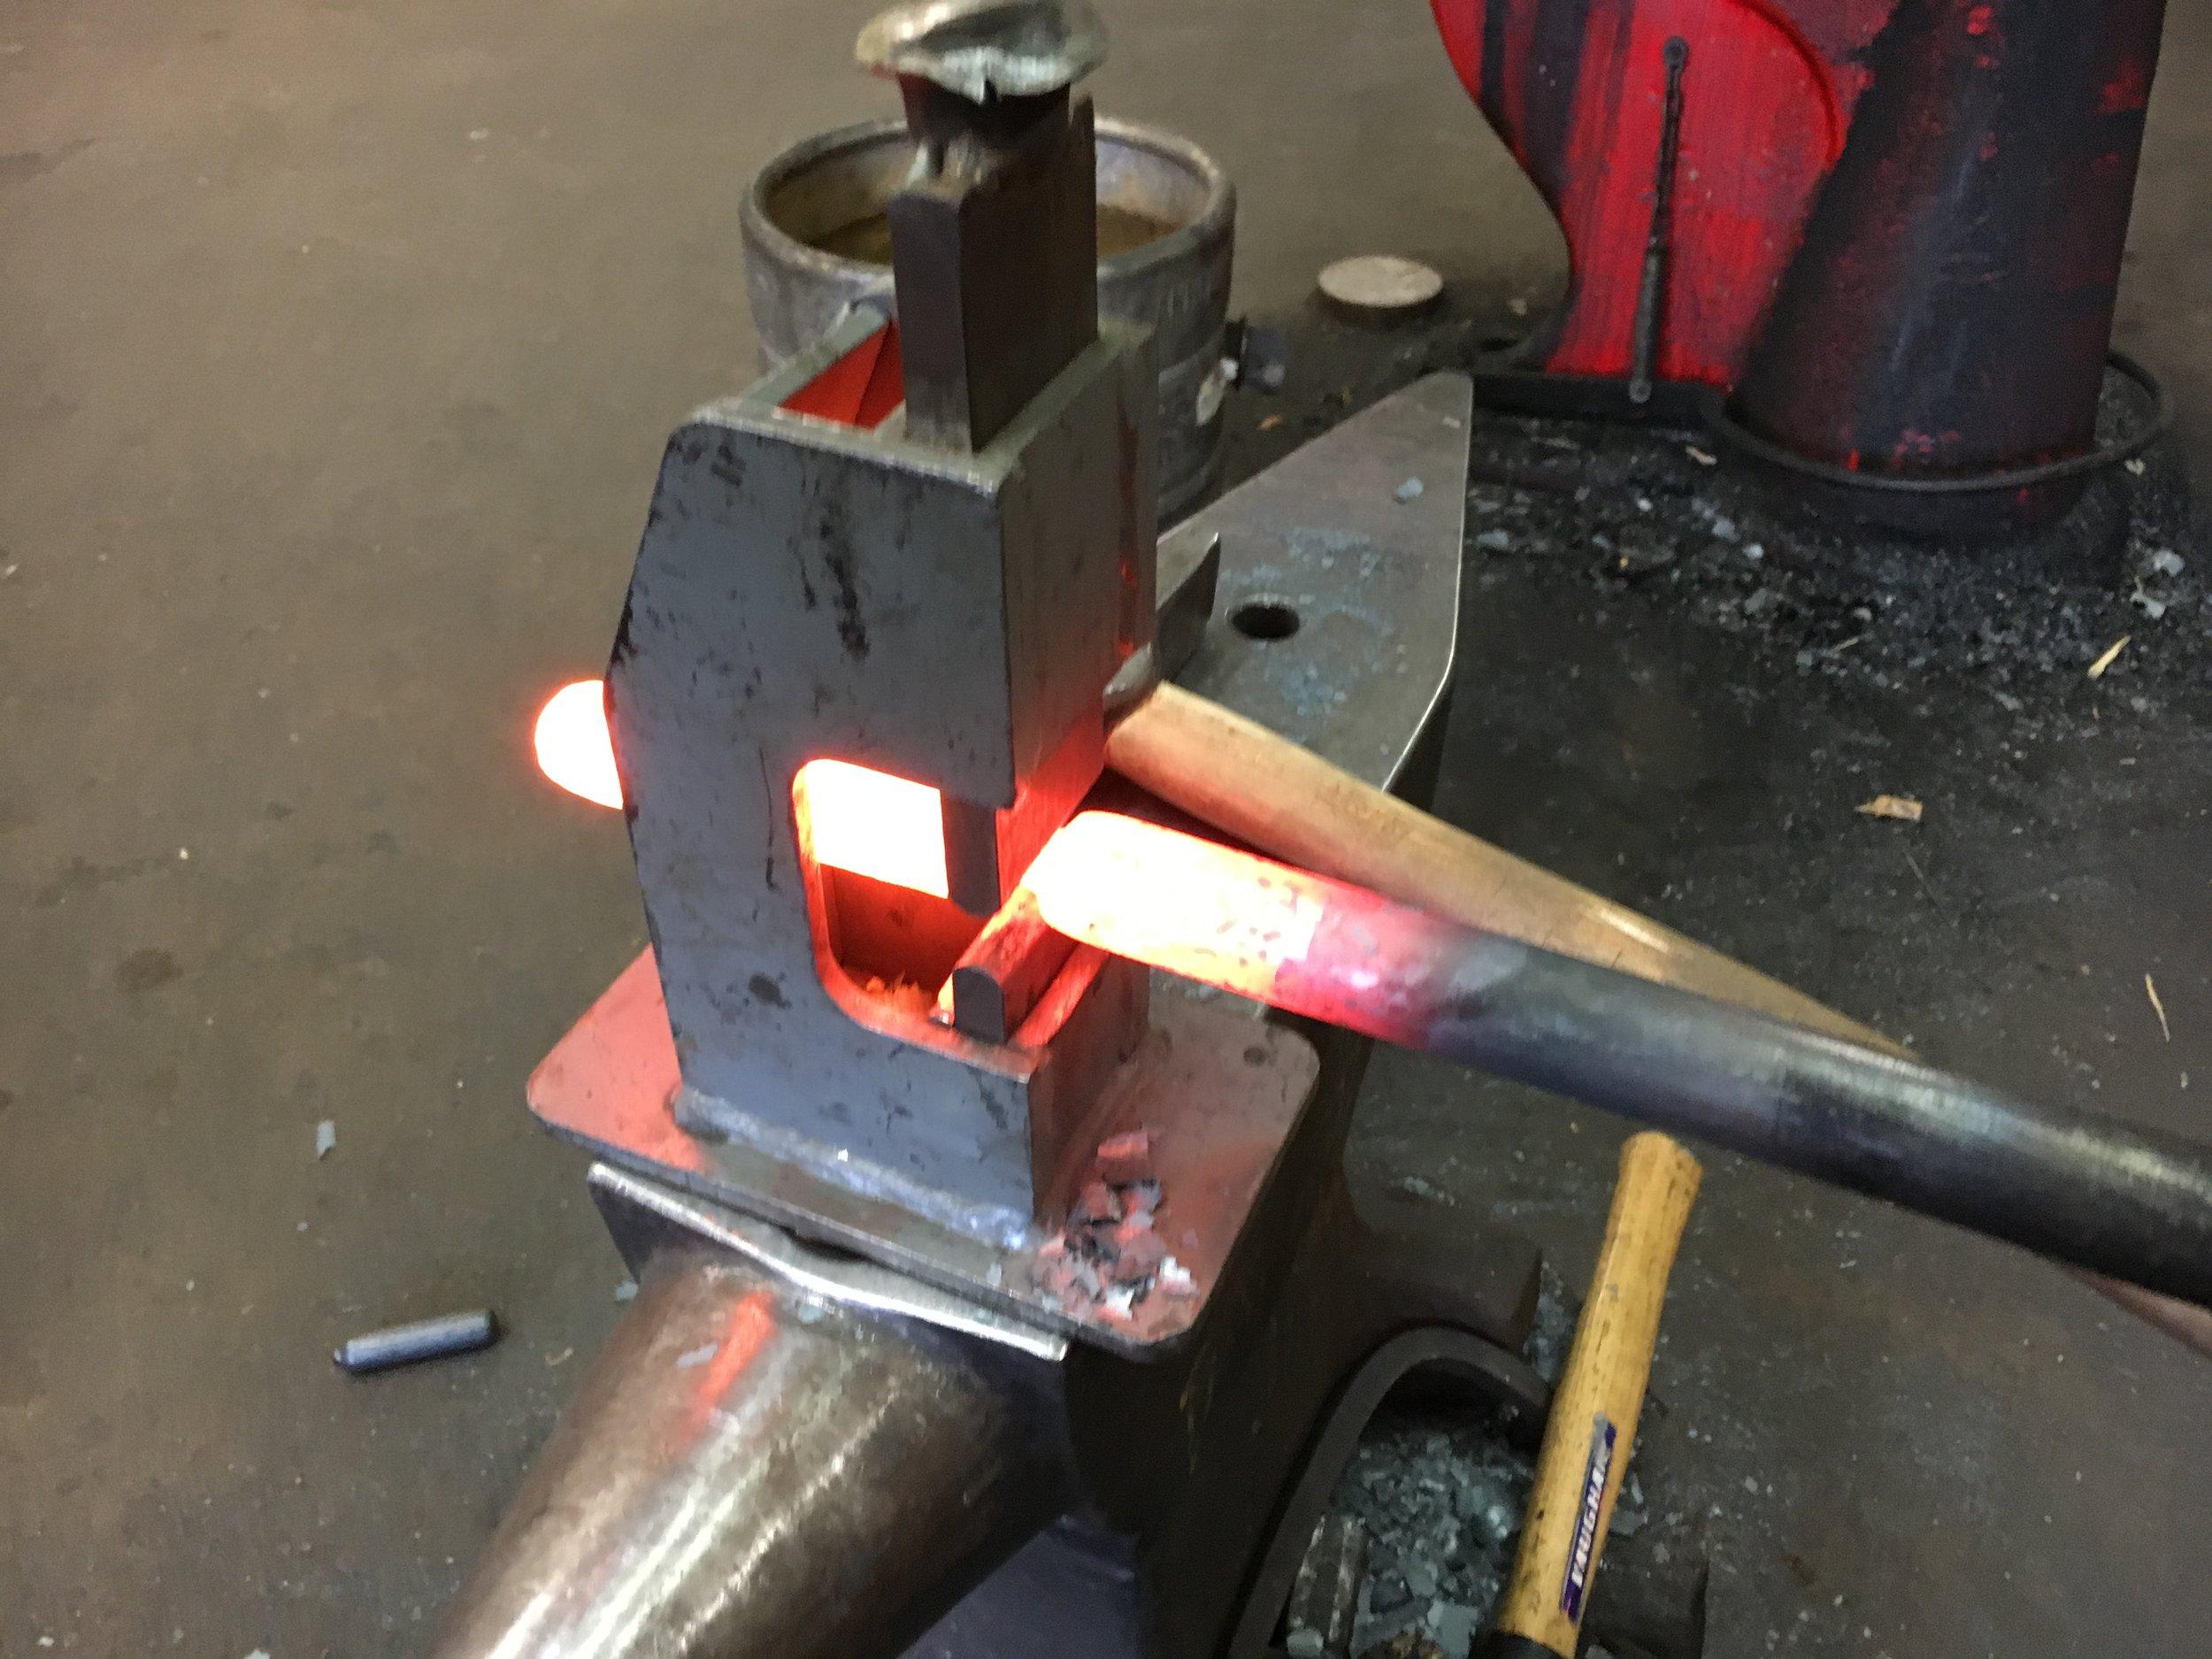 Using a fullering tool